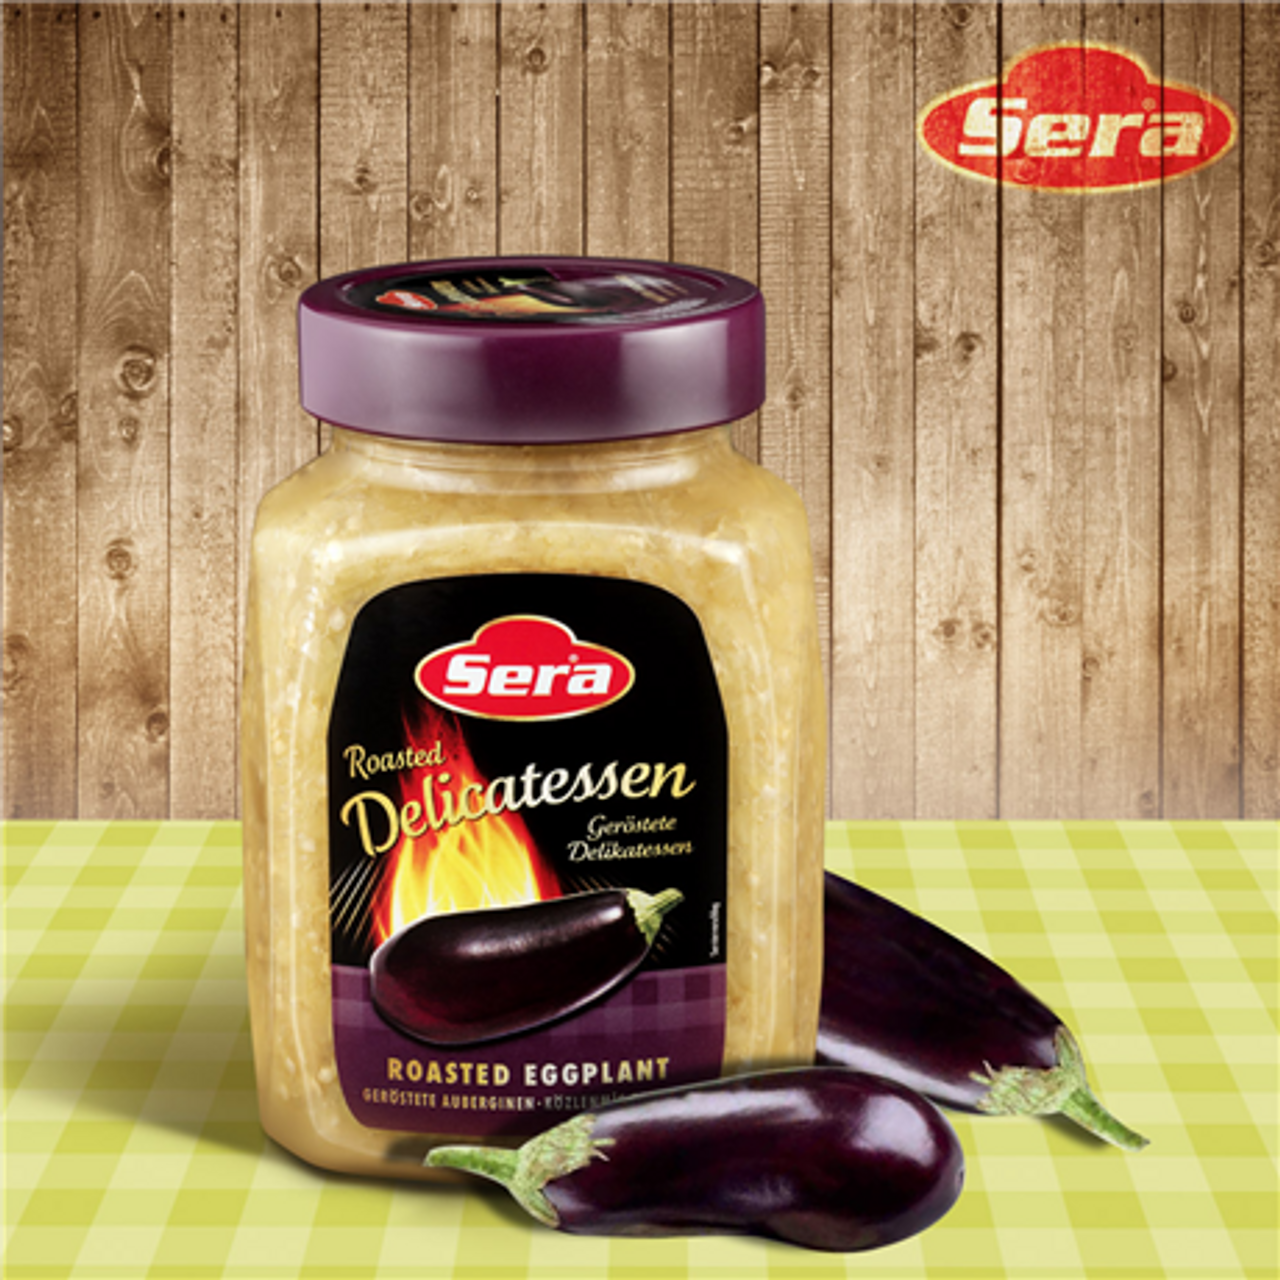 SERA Roasted Eggplant (Kozlenmis Patlican) 720g